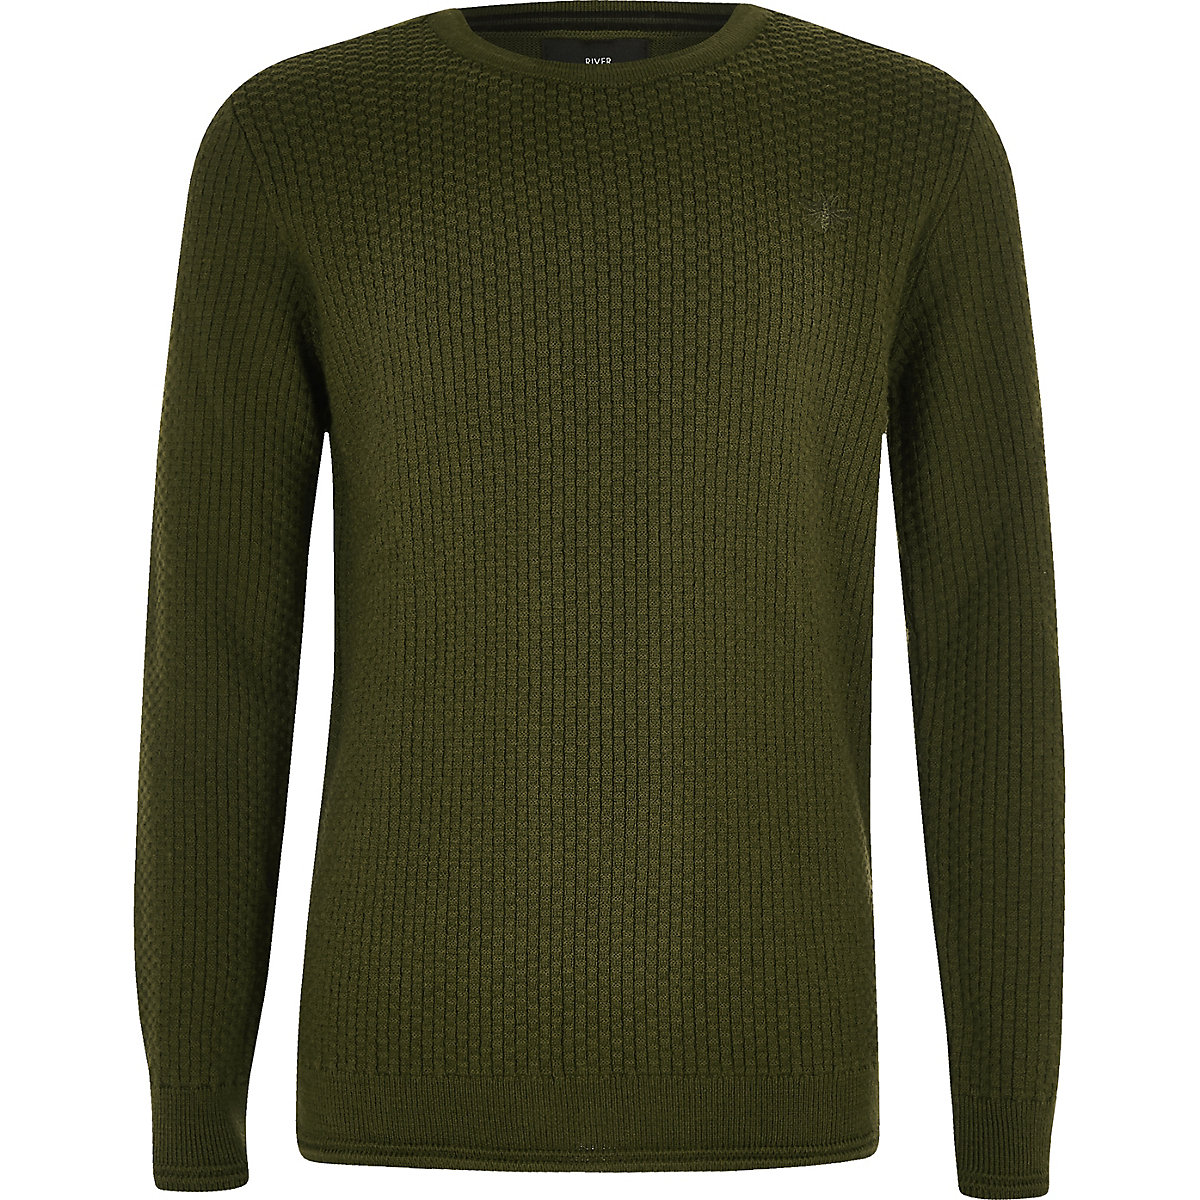 Boys khaki green textured sweater